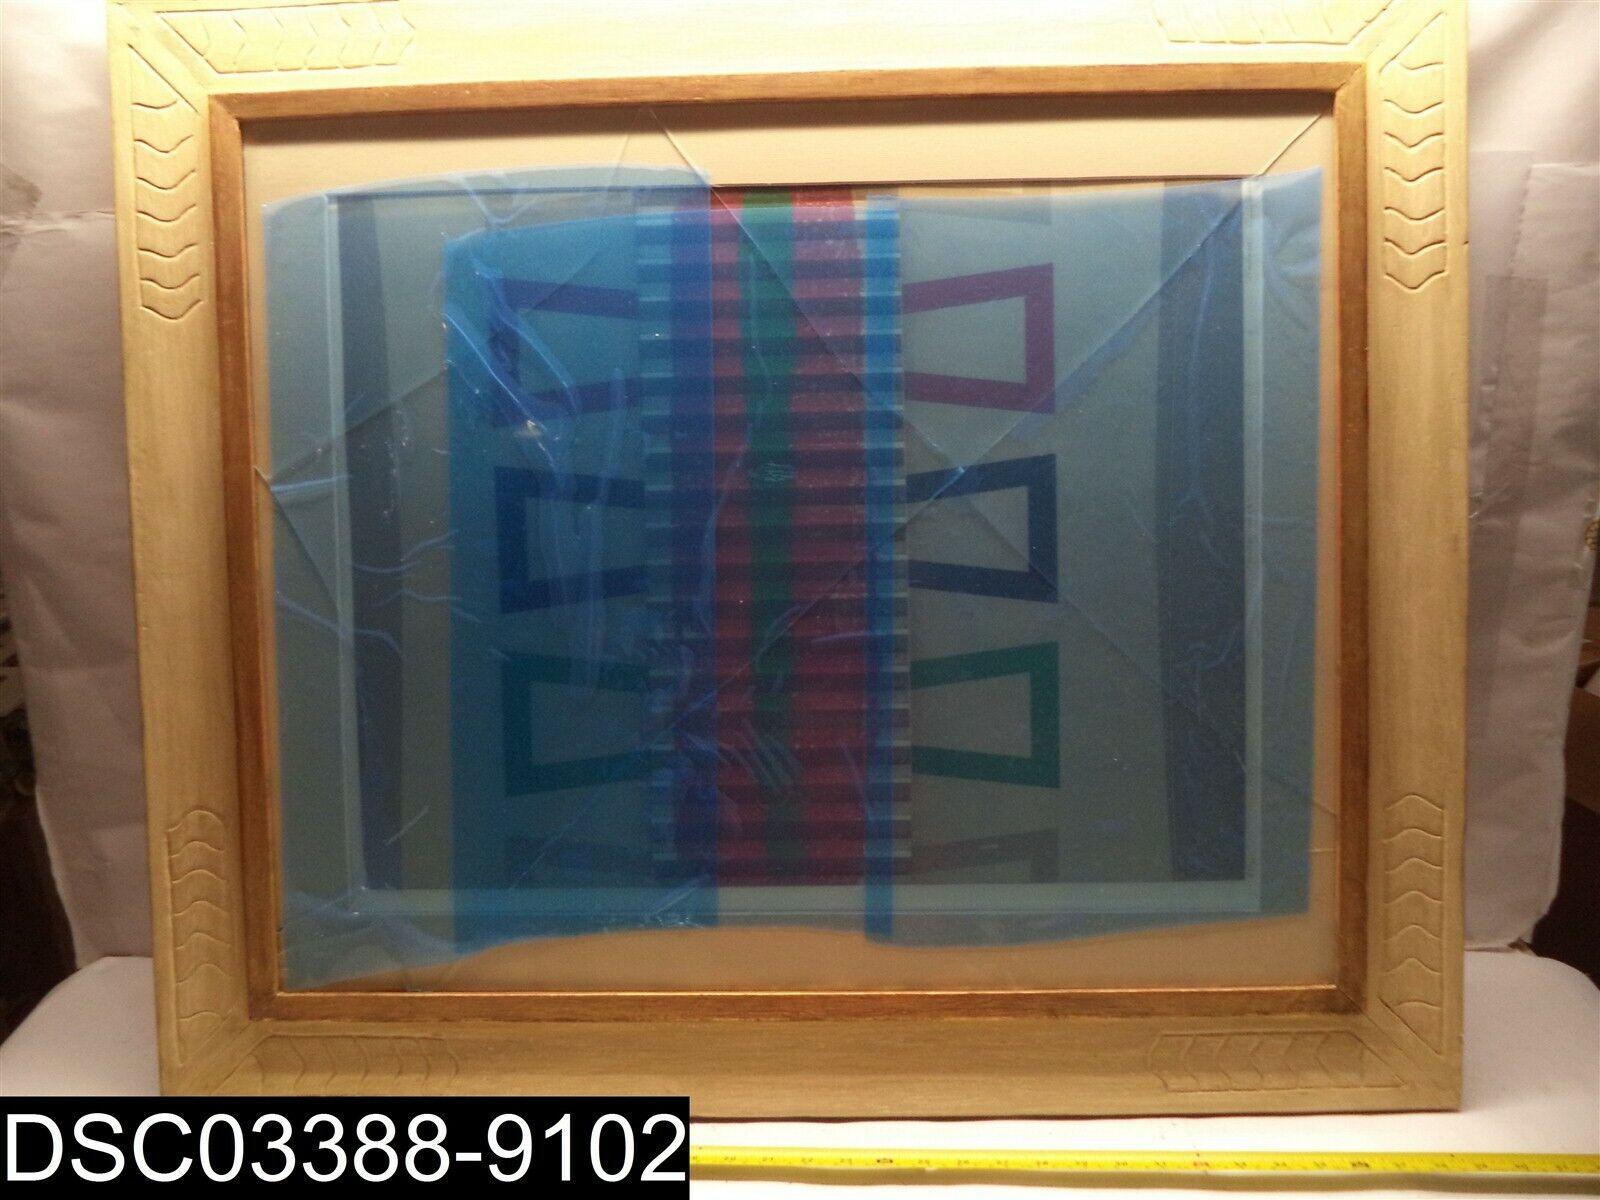 BROKEN GLASS  Decorative Wood Frame 36  x 31-1 2  OD and 28-3 4  X 23-1 2  ID